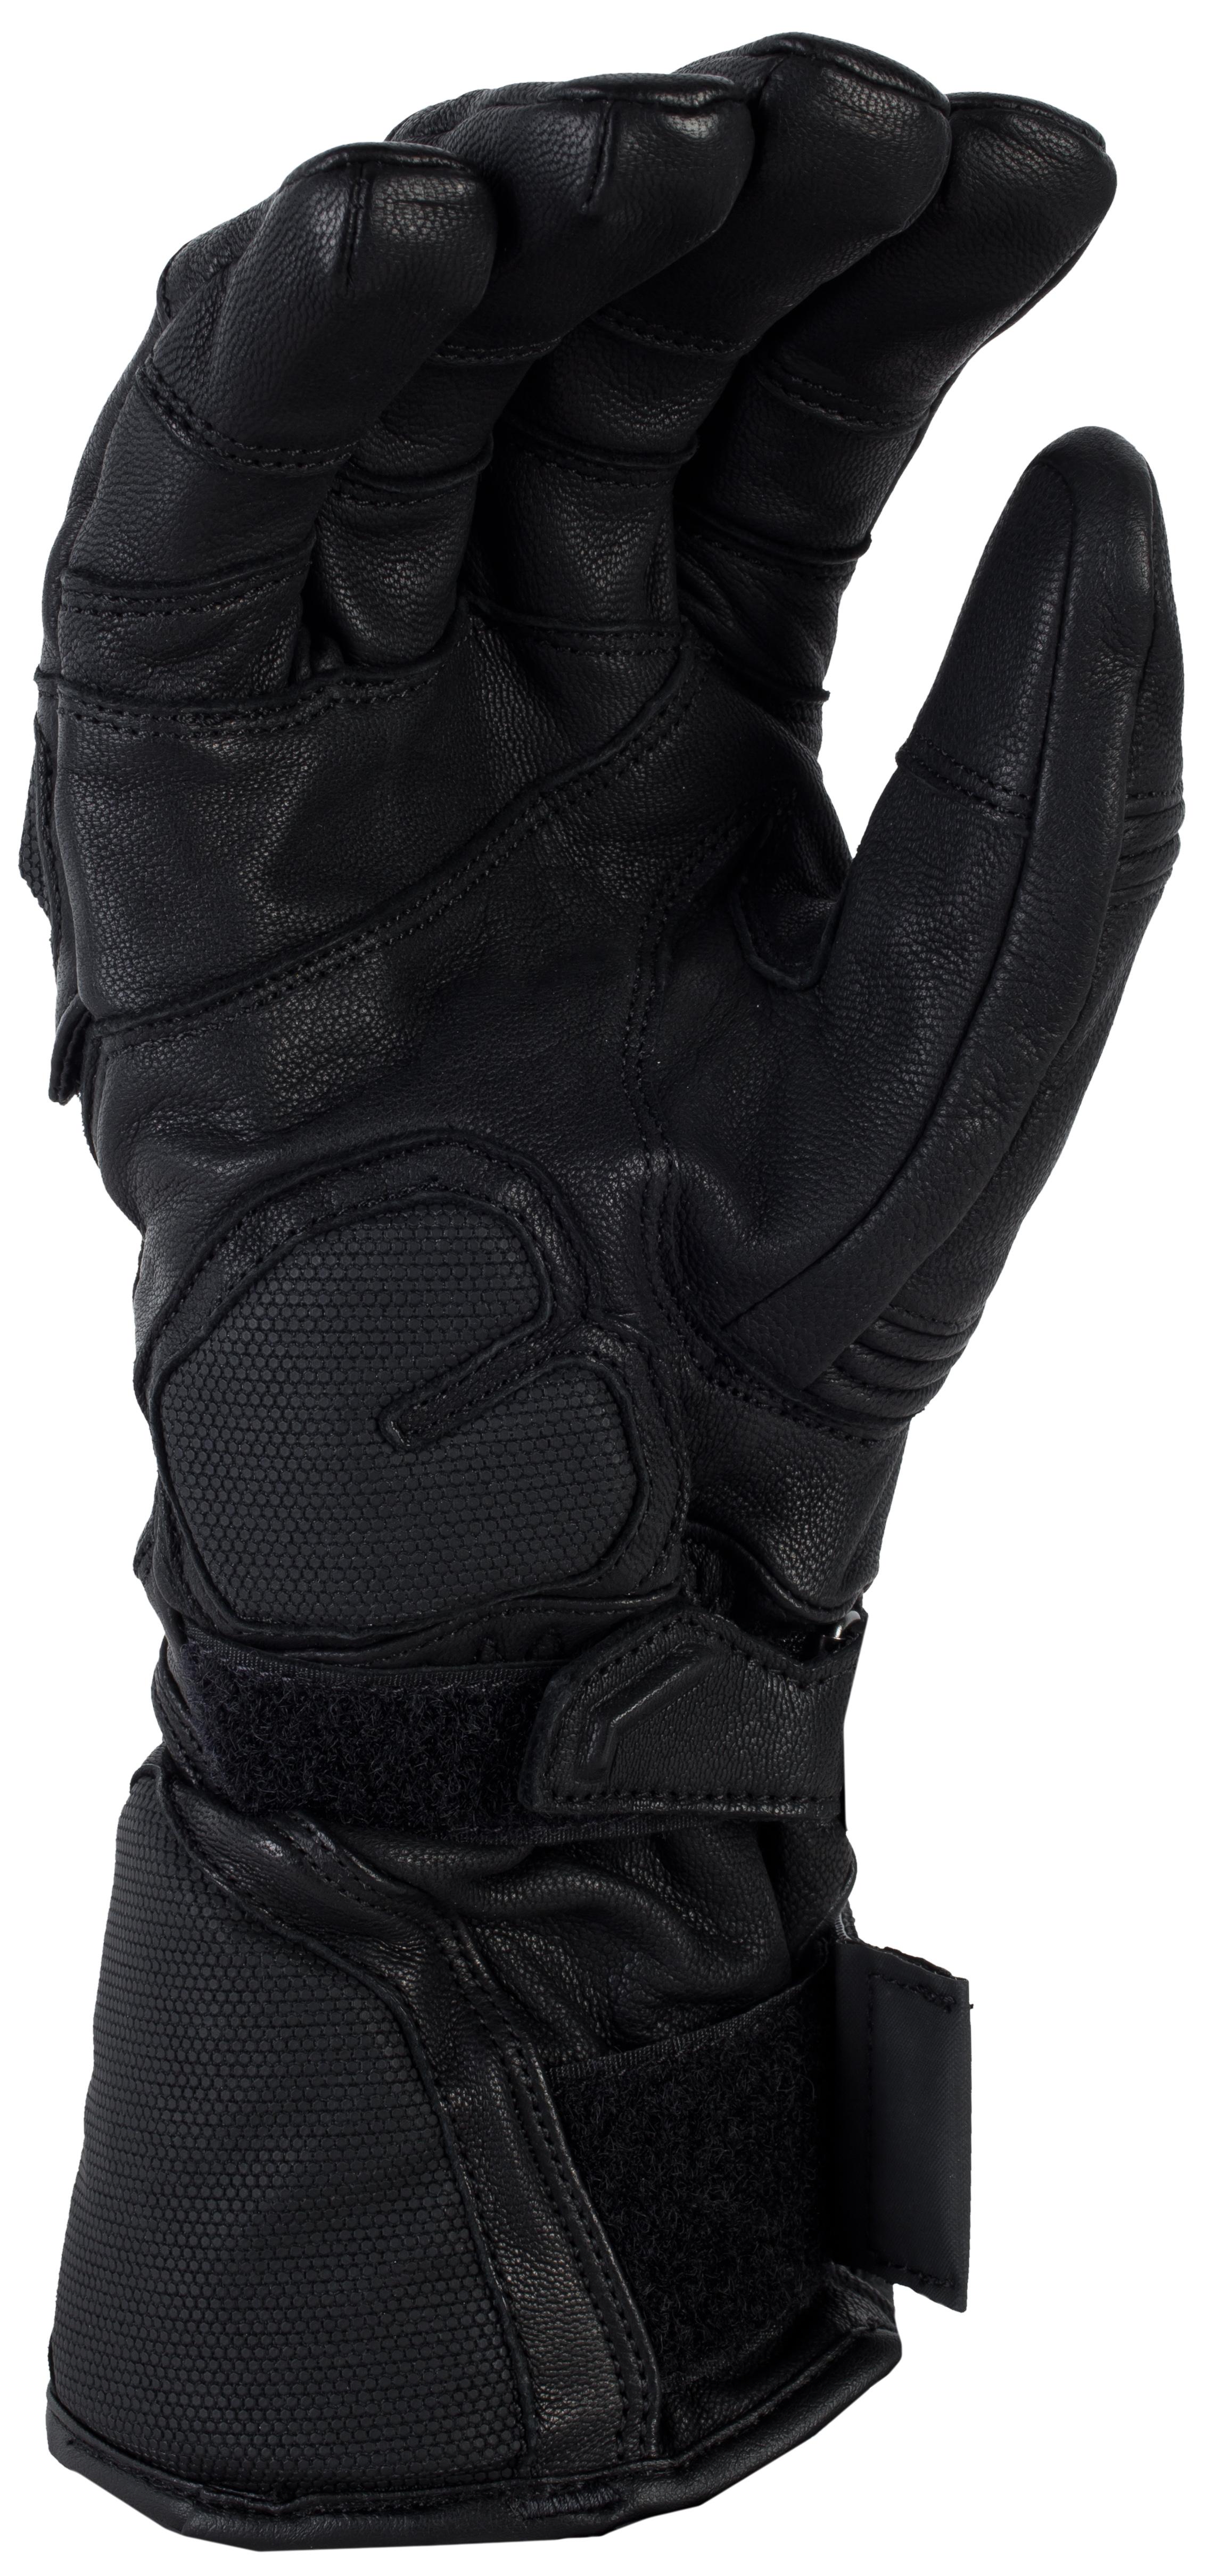 Adventure Glove Long 5032-001-000-B